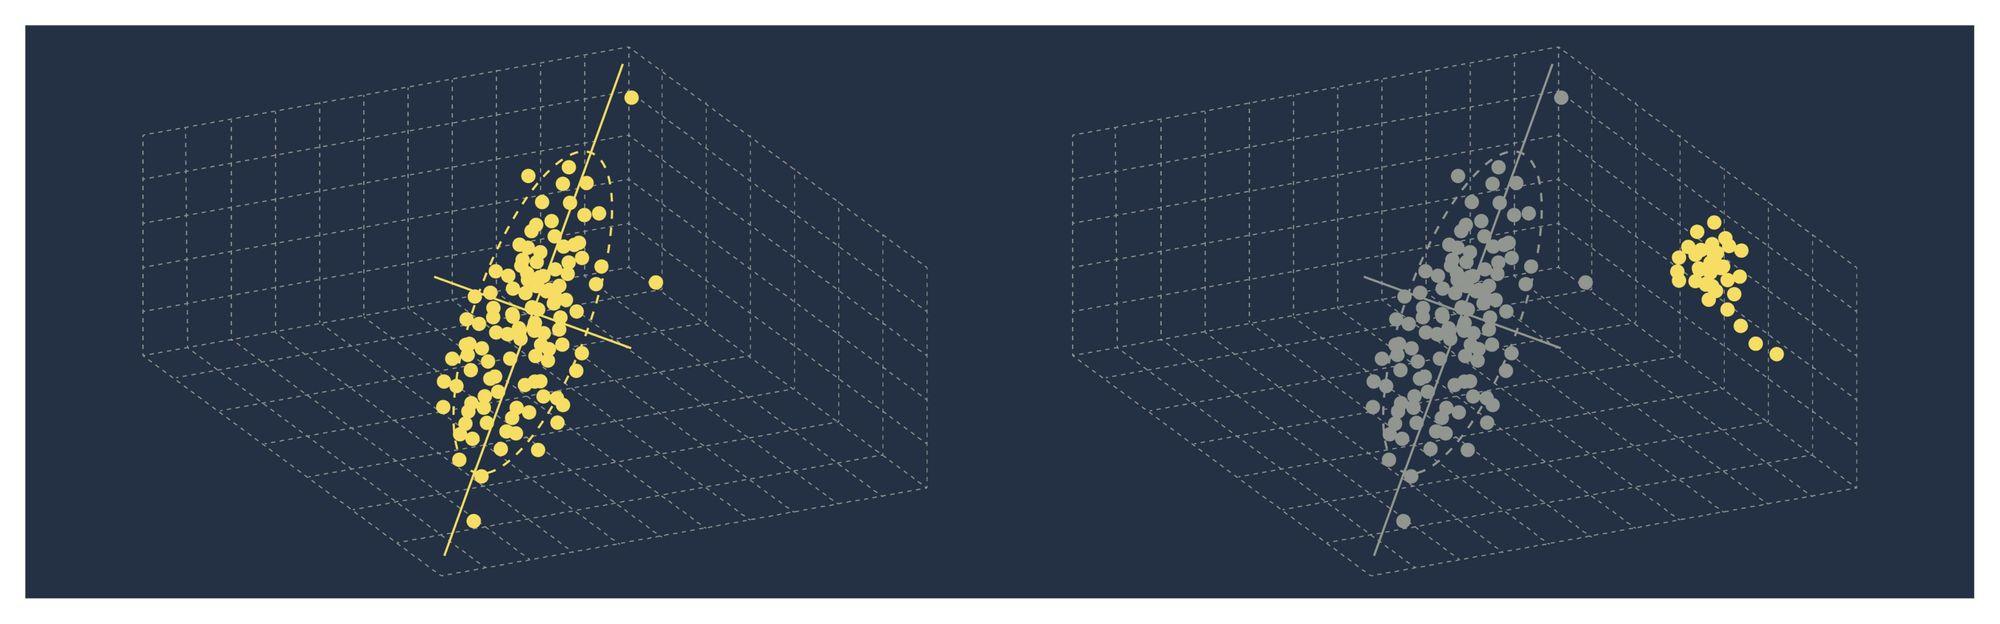 principal-component-analysis